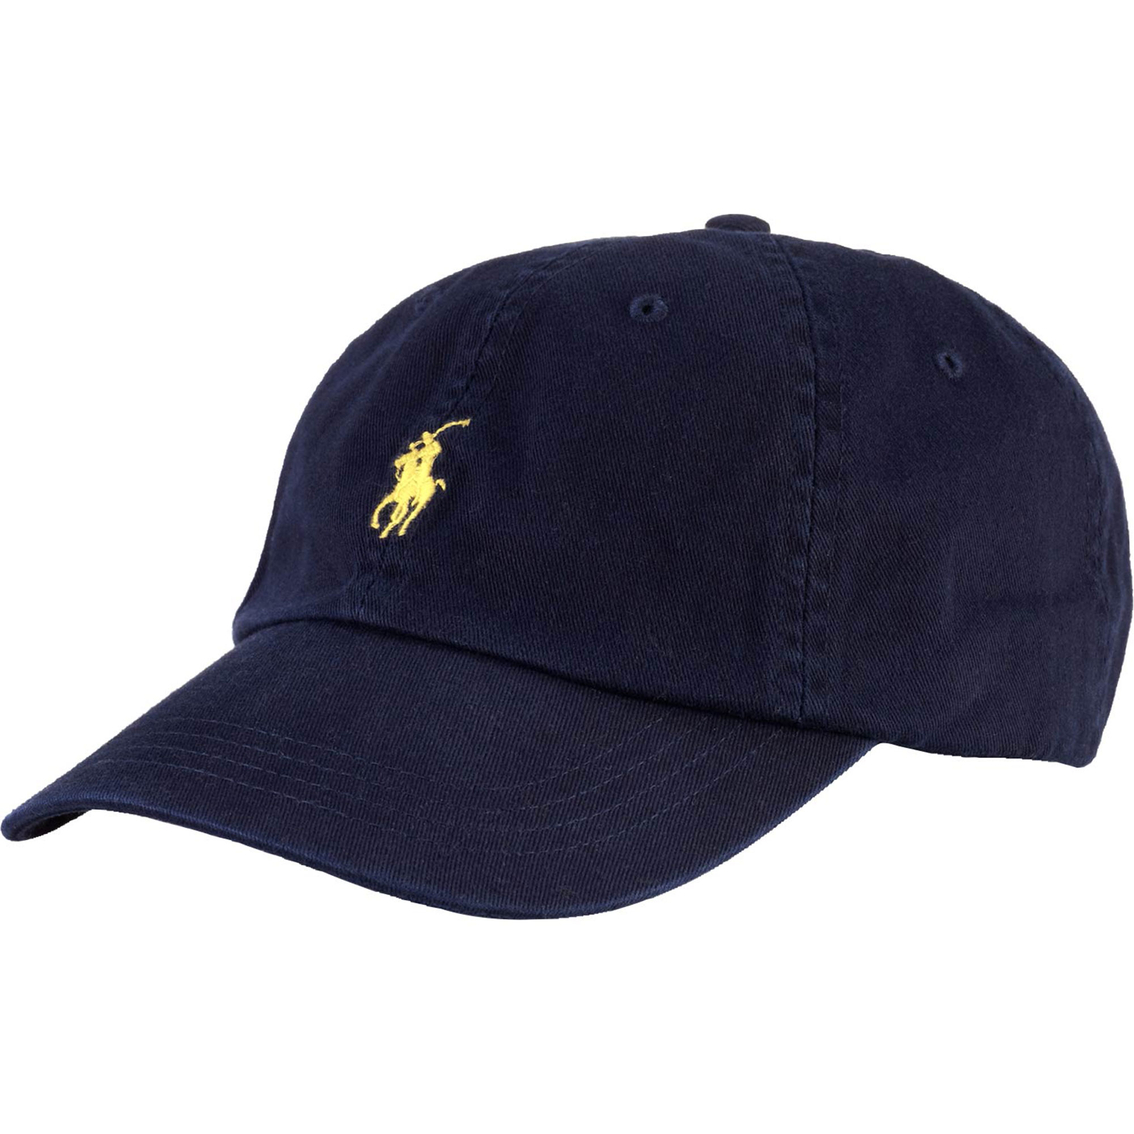 9237446cdf3 Polo Ralph Lauren Cotton Oxford Sports Cap